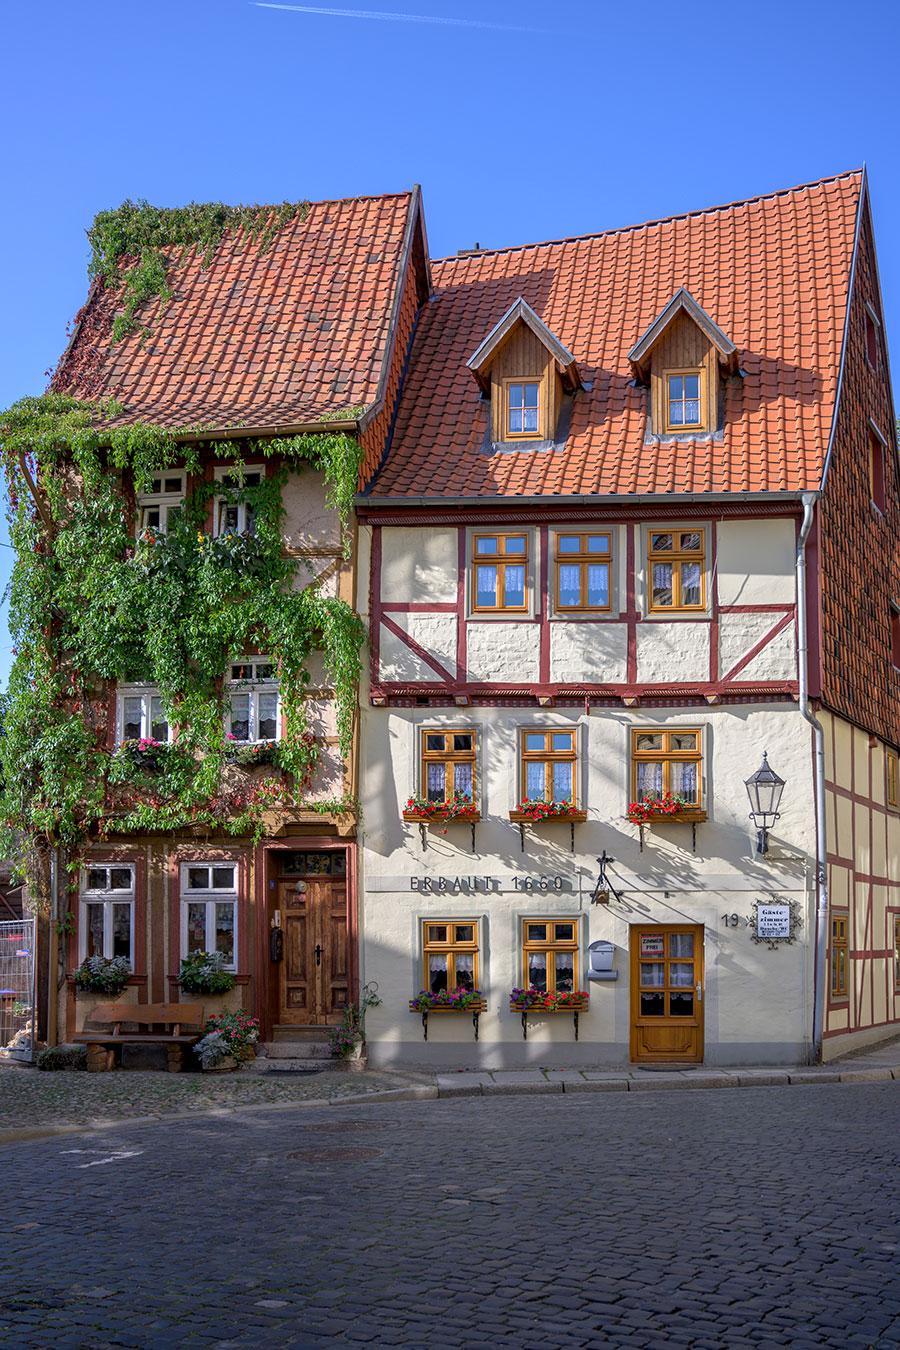 01-UNESCO-Fachwerk-190822_Quedlinburg-Foto-Alexander-Kaßner